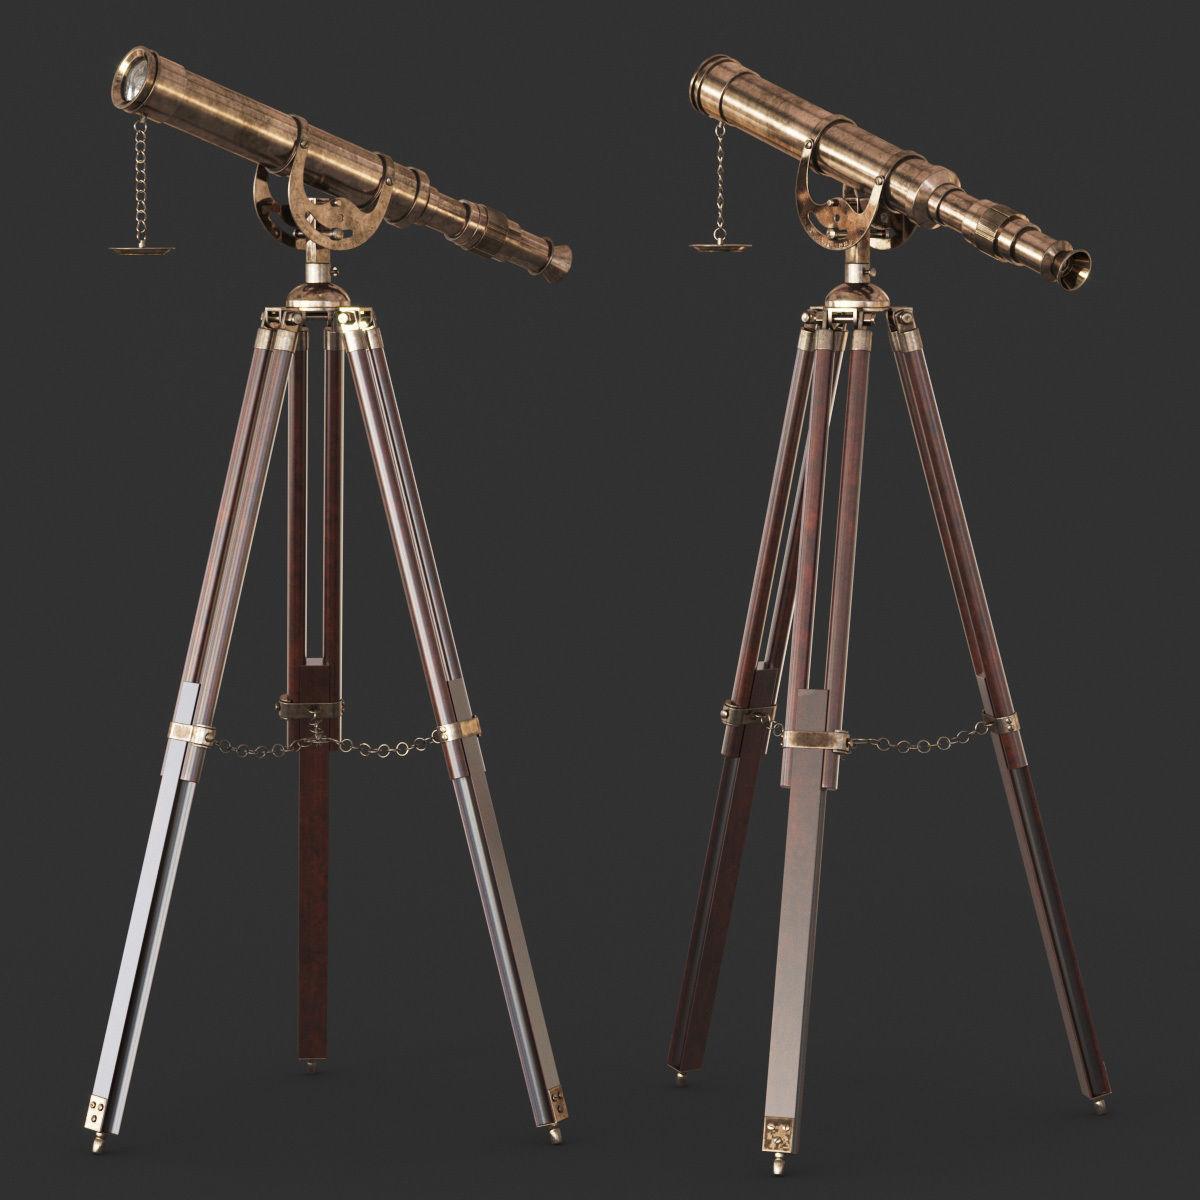 Vintage Antique Tripod Telescope